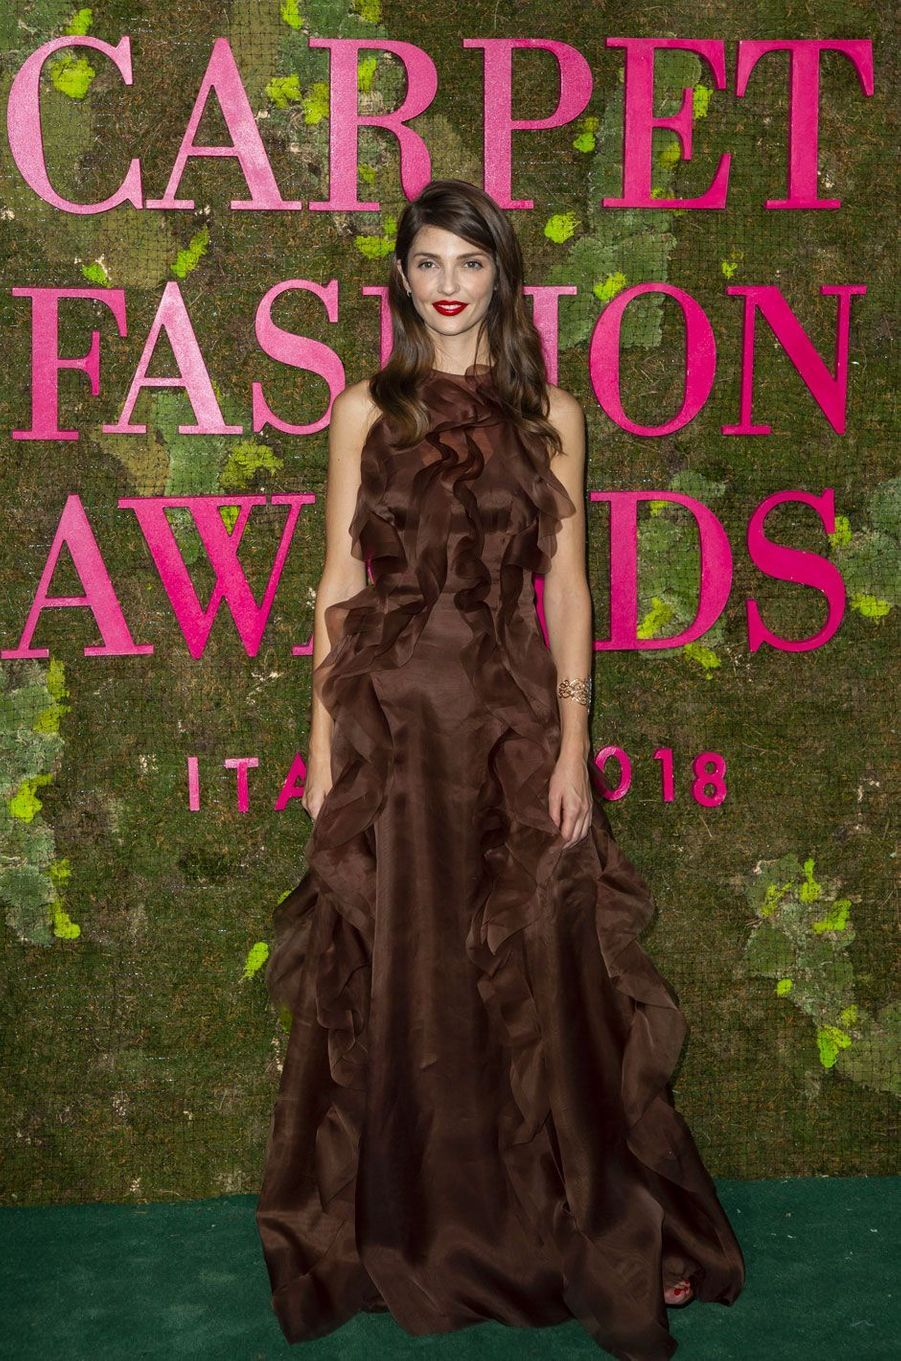 Annabelle Belmondo aux Green Fashion Awards à Milan, le 23 septembre 2018